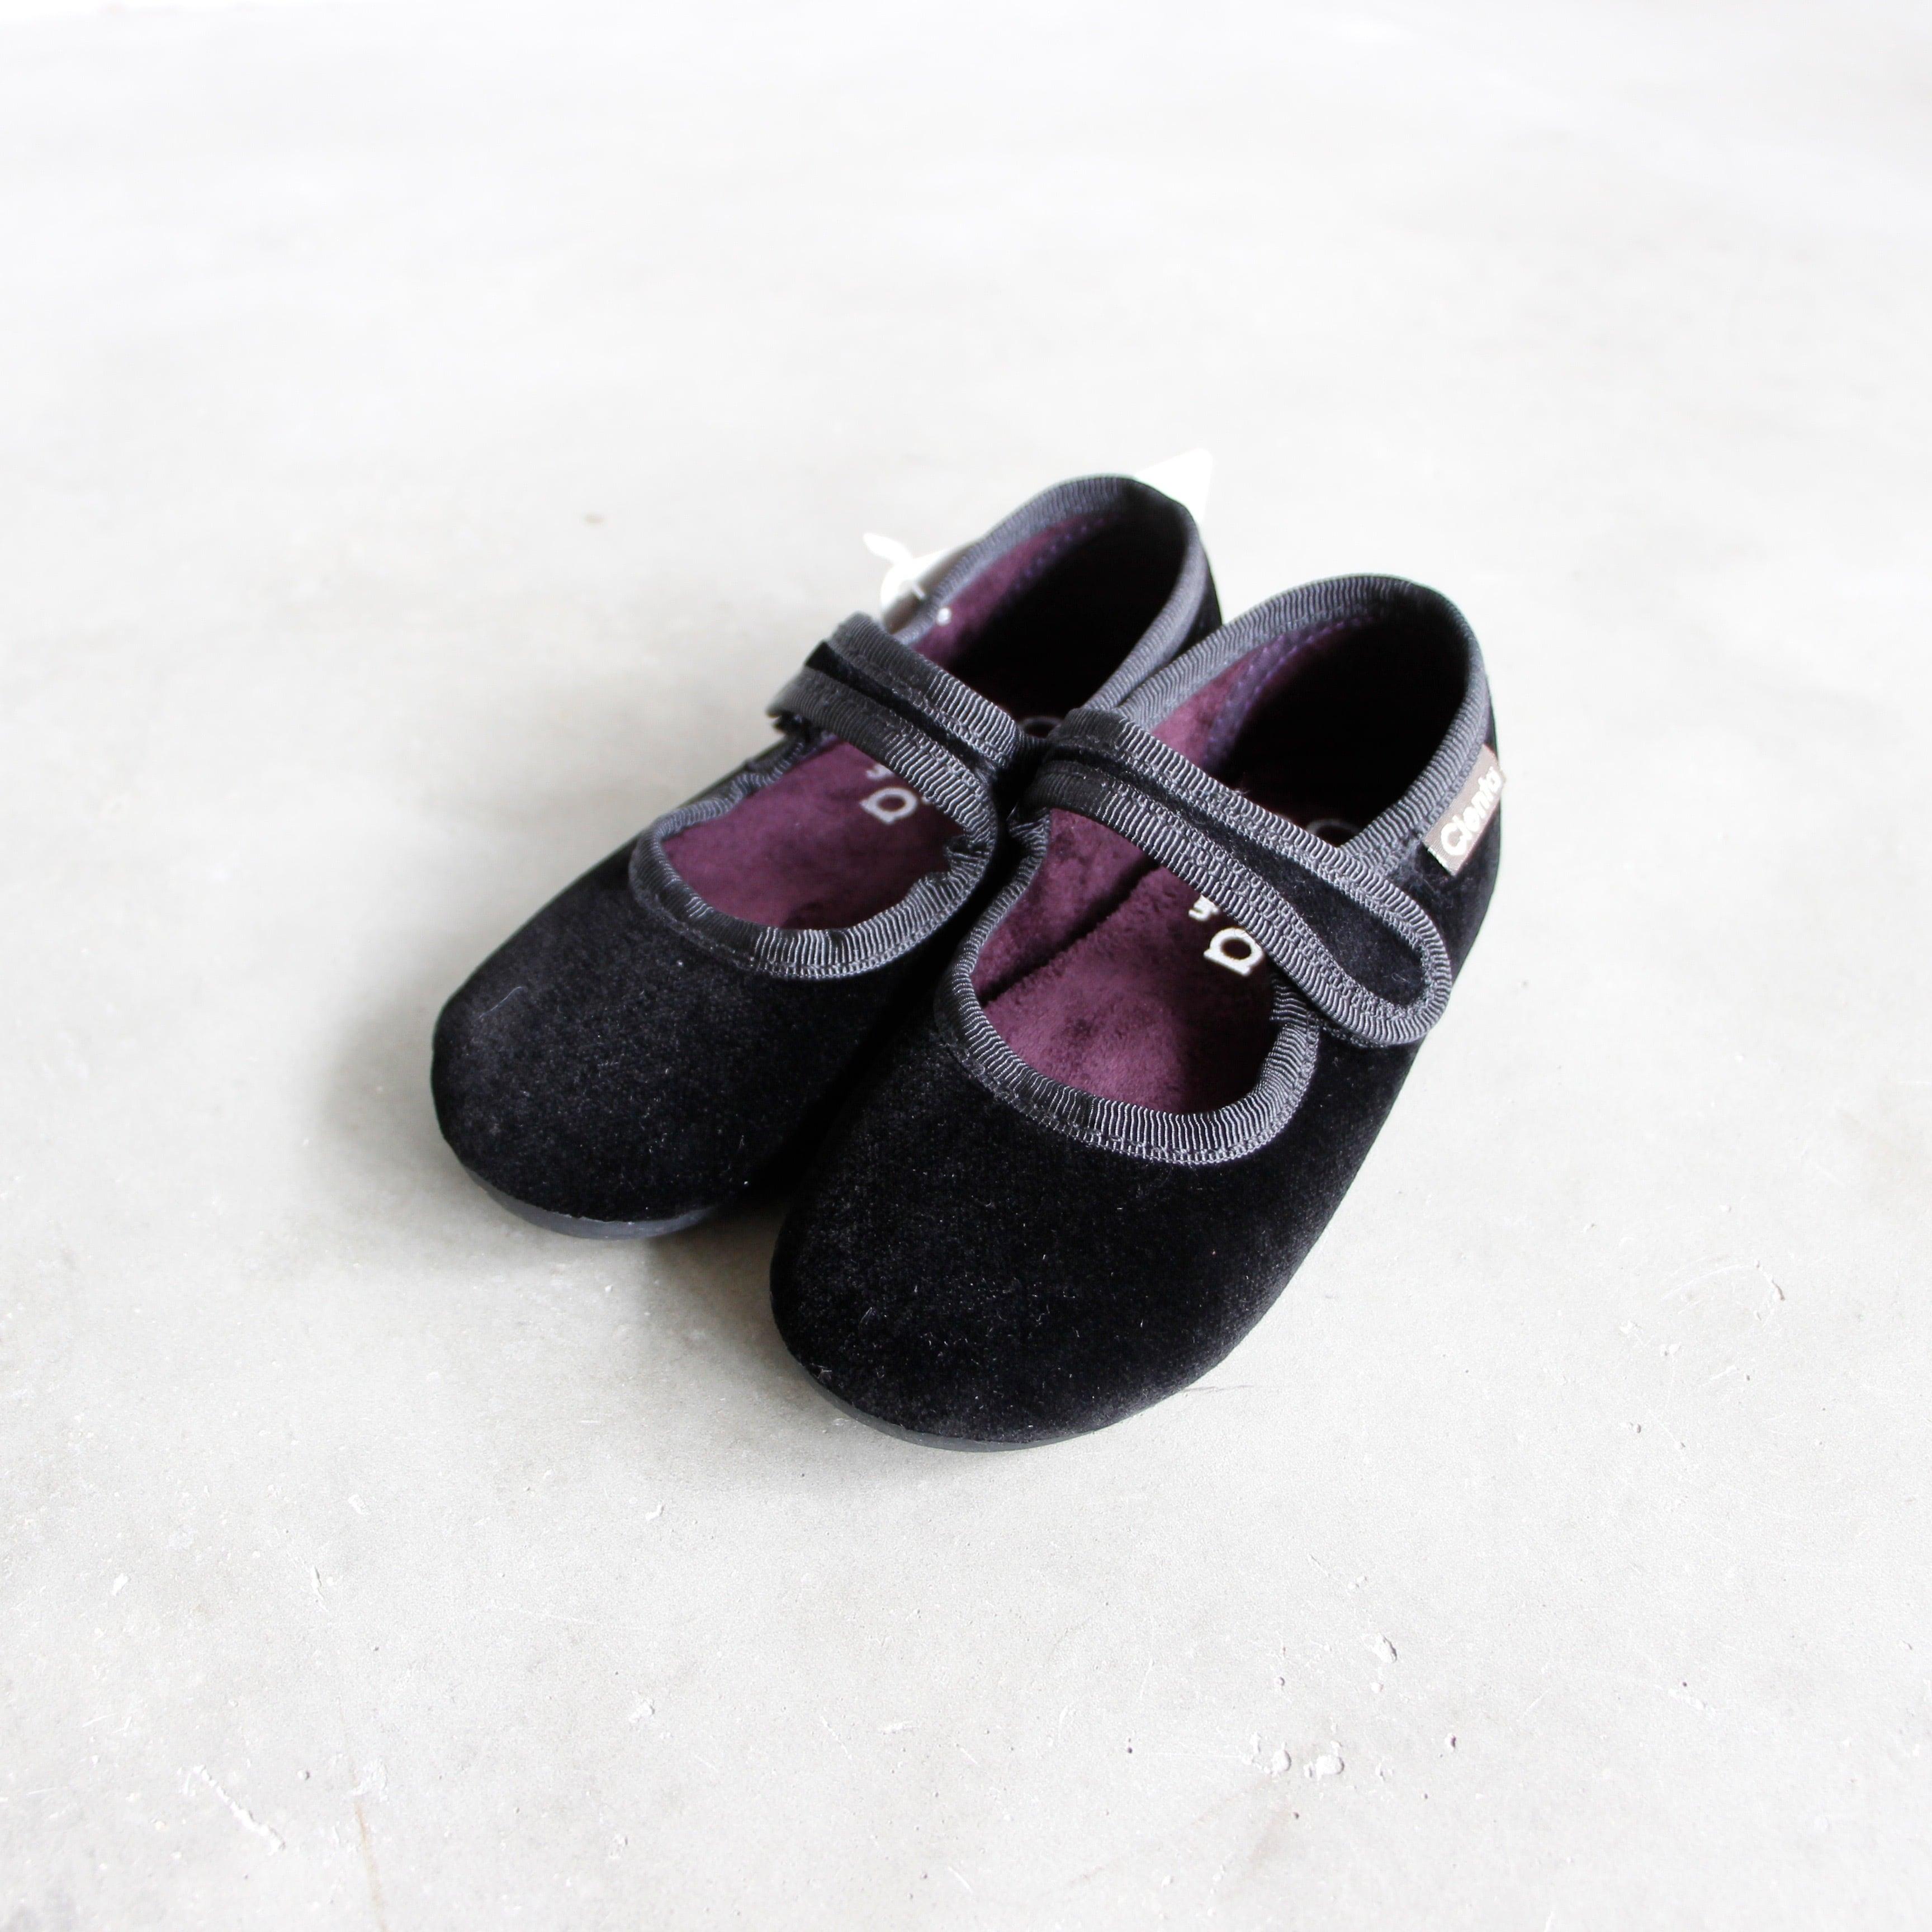 《CIENTA》フォーマルストラップ / veloure black / 22-23cm